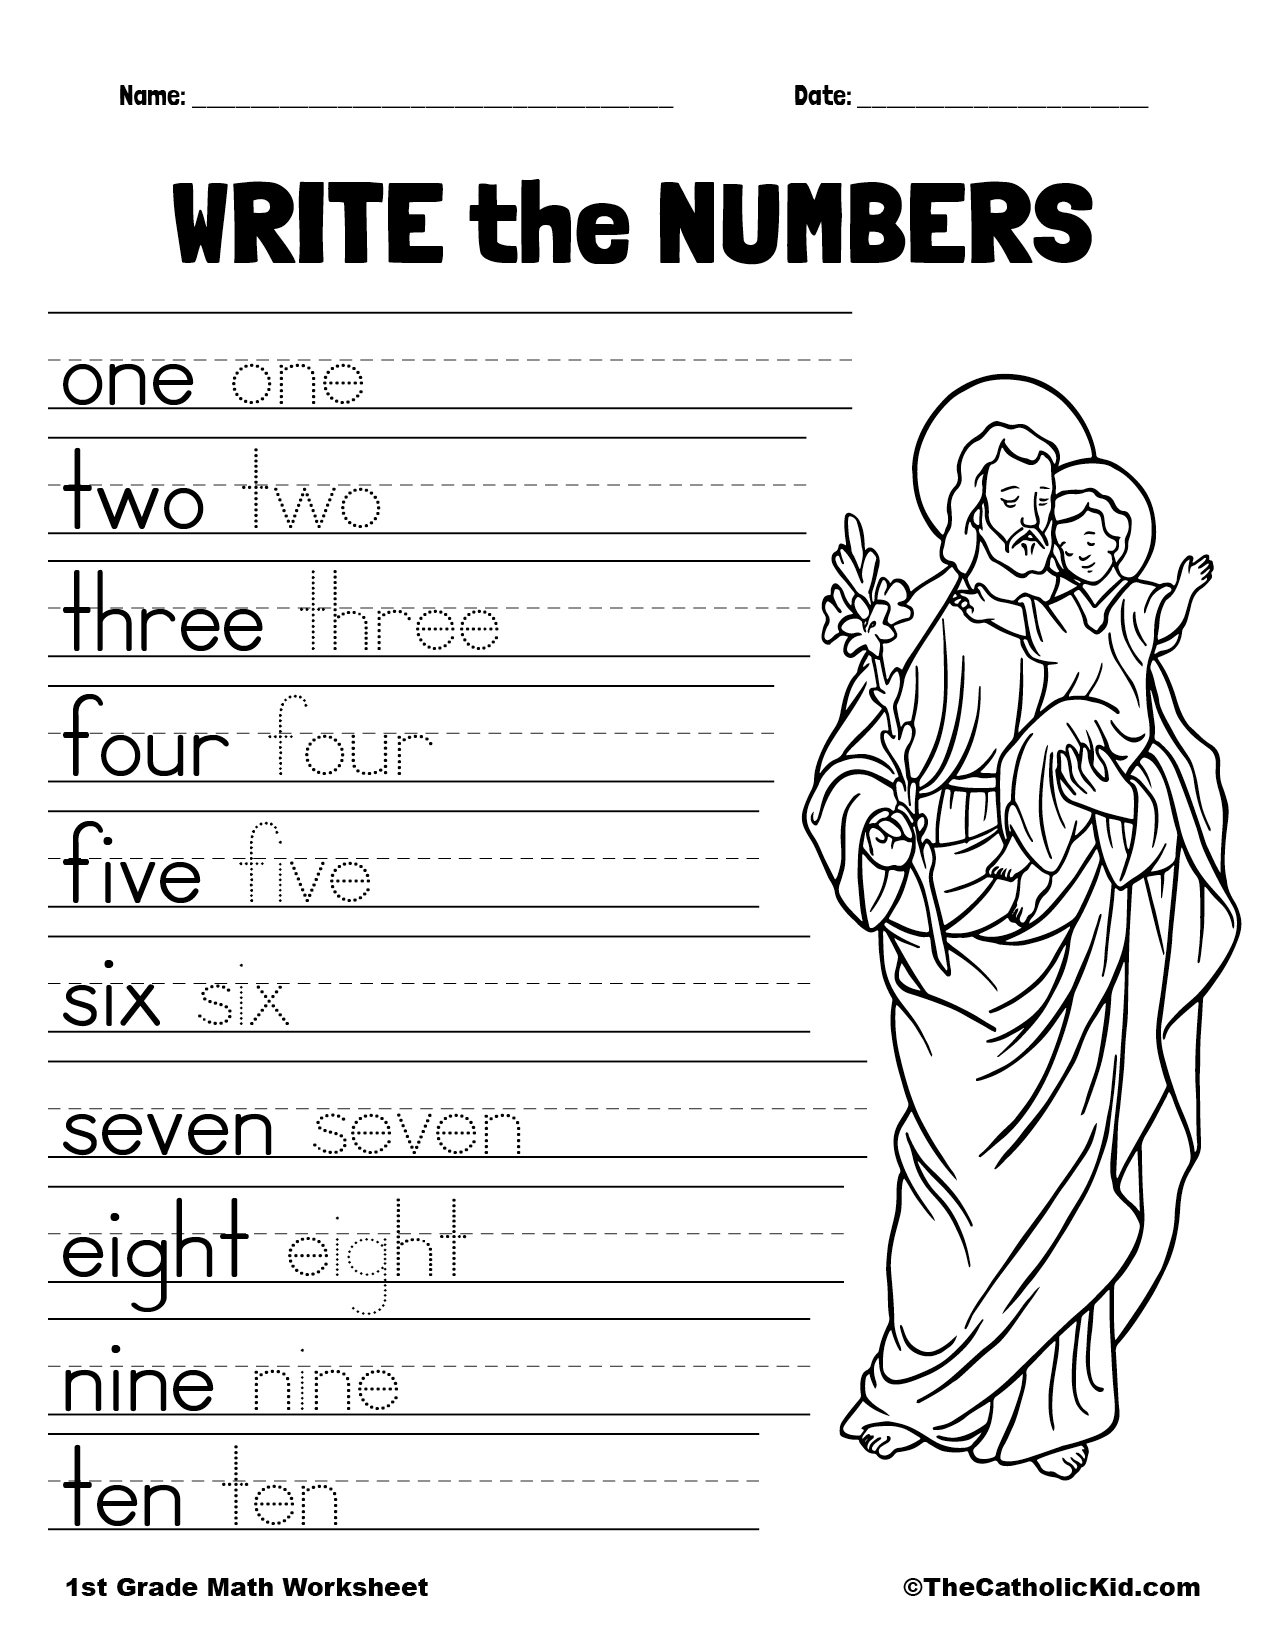 Write the Numbers - 1st Grade Math Worksheet Catholic